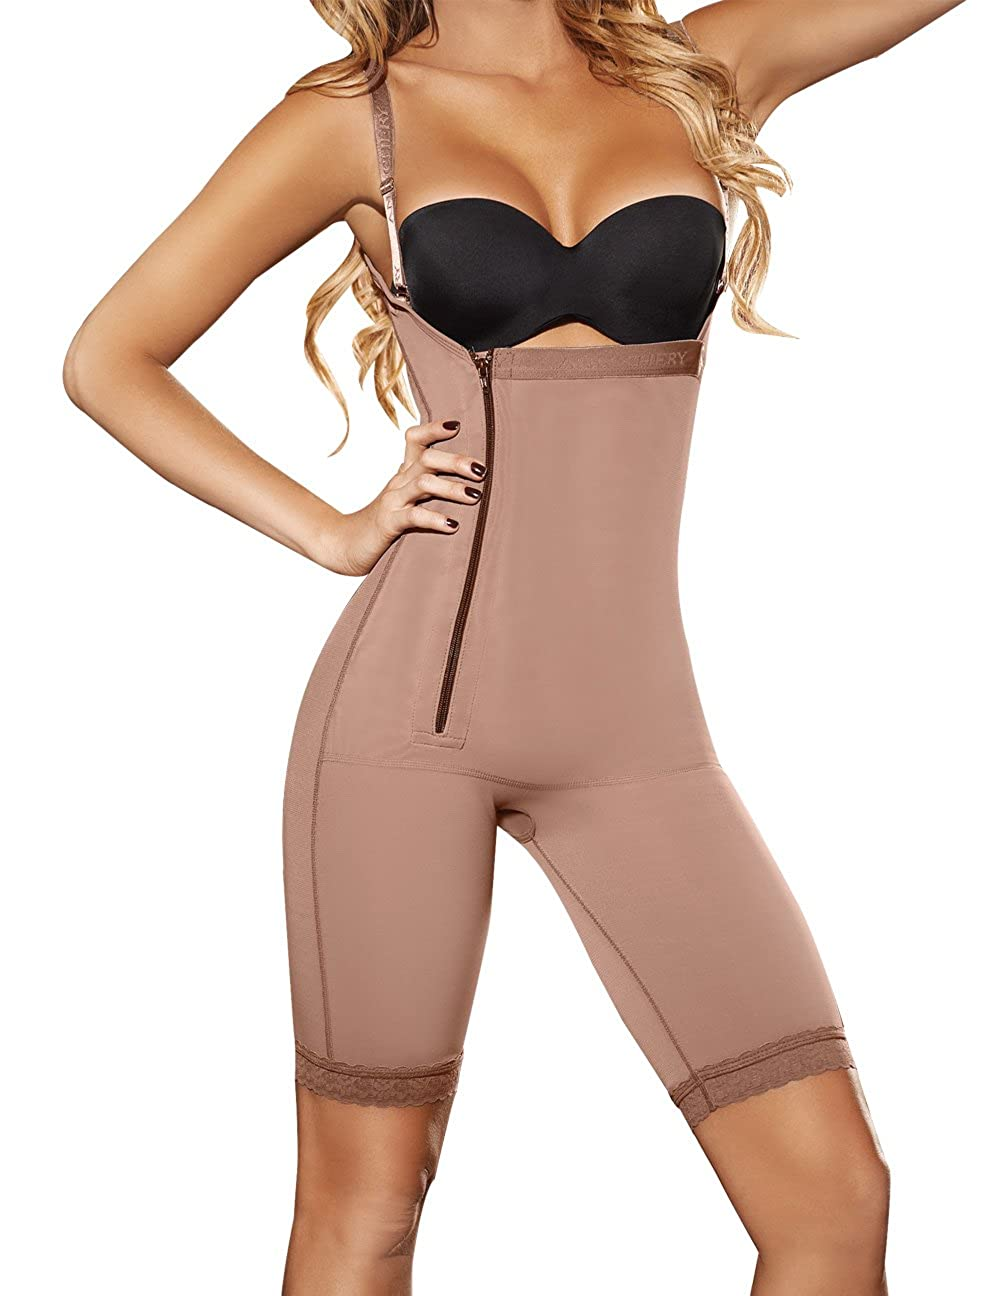 e924e26dc950d Ann Chery Women s Powernet Angelina Shapewear at Amazon Women s Clothing  store